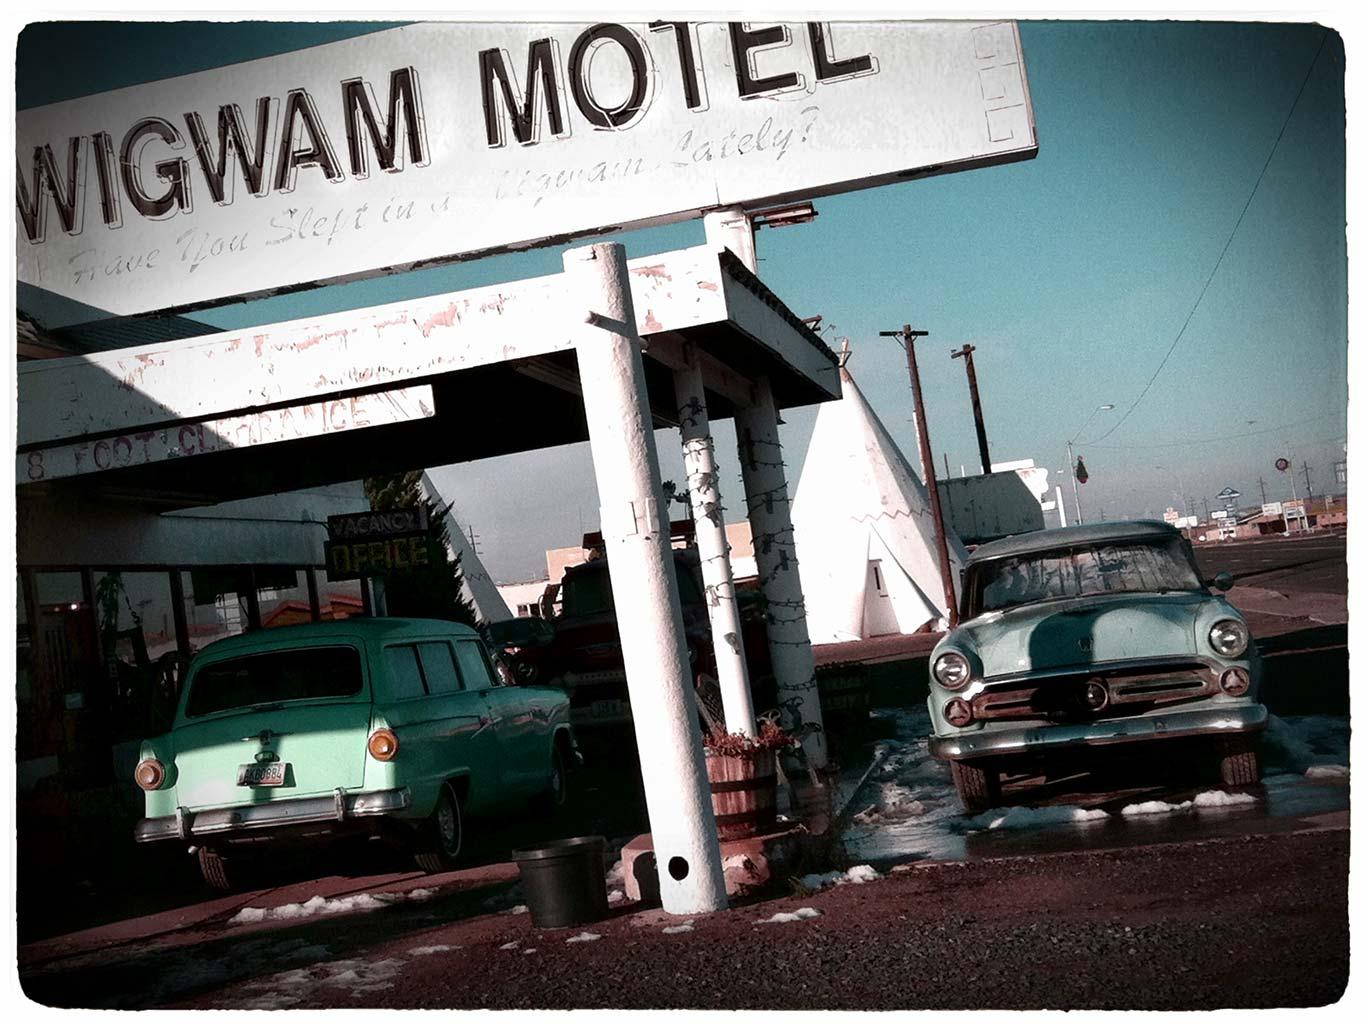 Wigwam Motel, Route 66 - Arizona